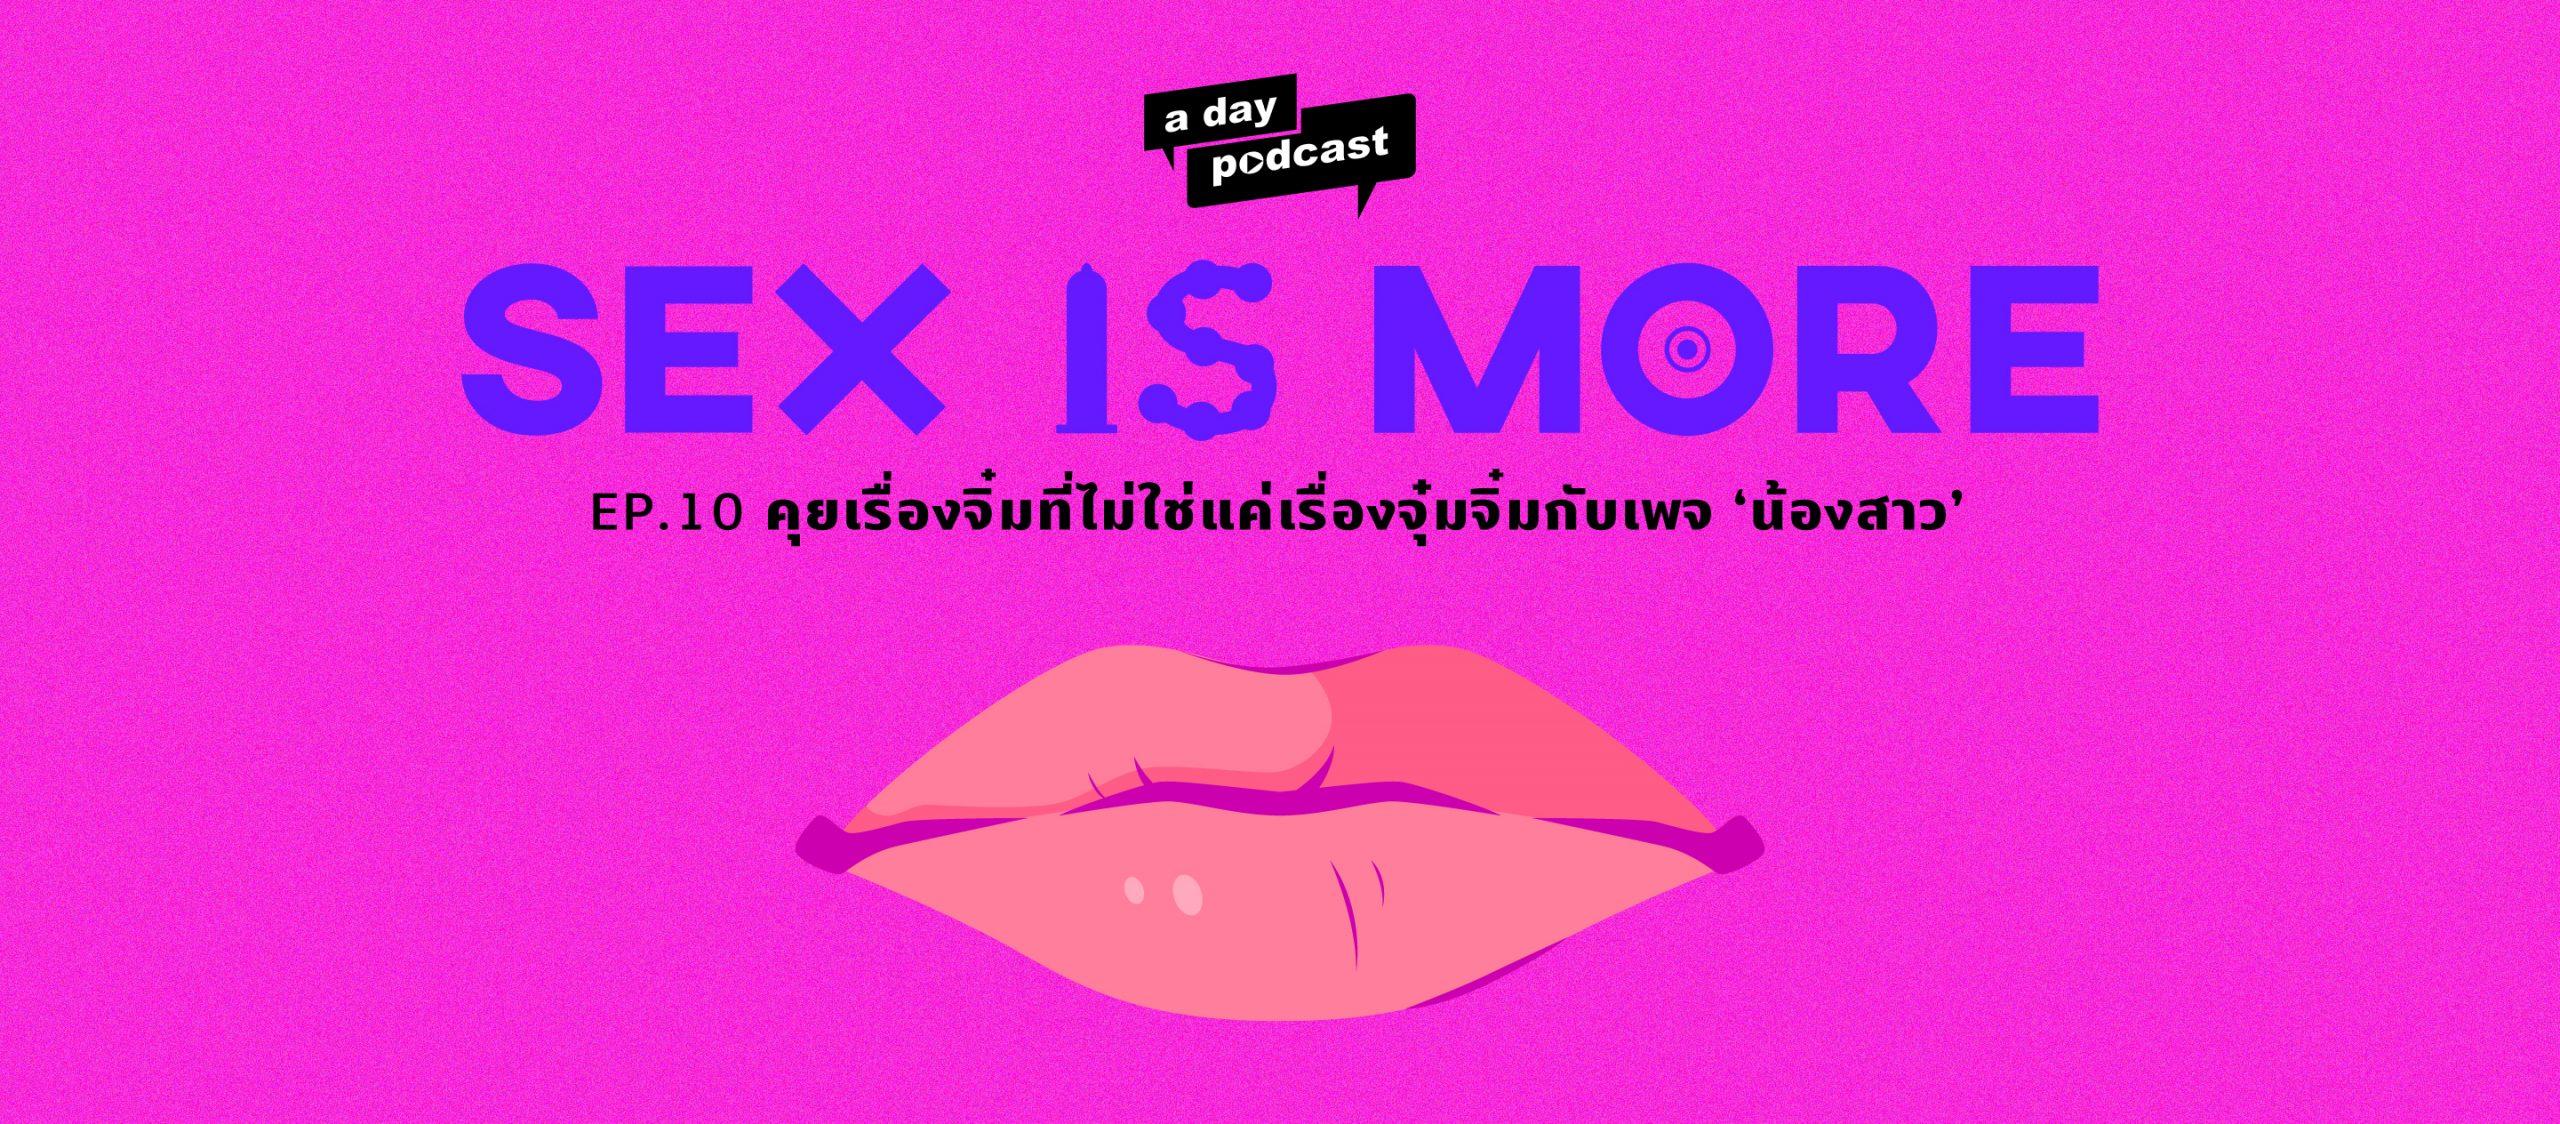 Sex is More EP.10 คุยเรื่องจิ๋มที่ไม่ใช่แค่เรื่องจุ๋มจิ๋มกับเพจ 'น้องสาว'